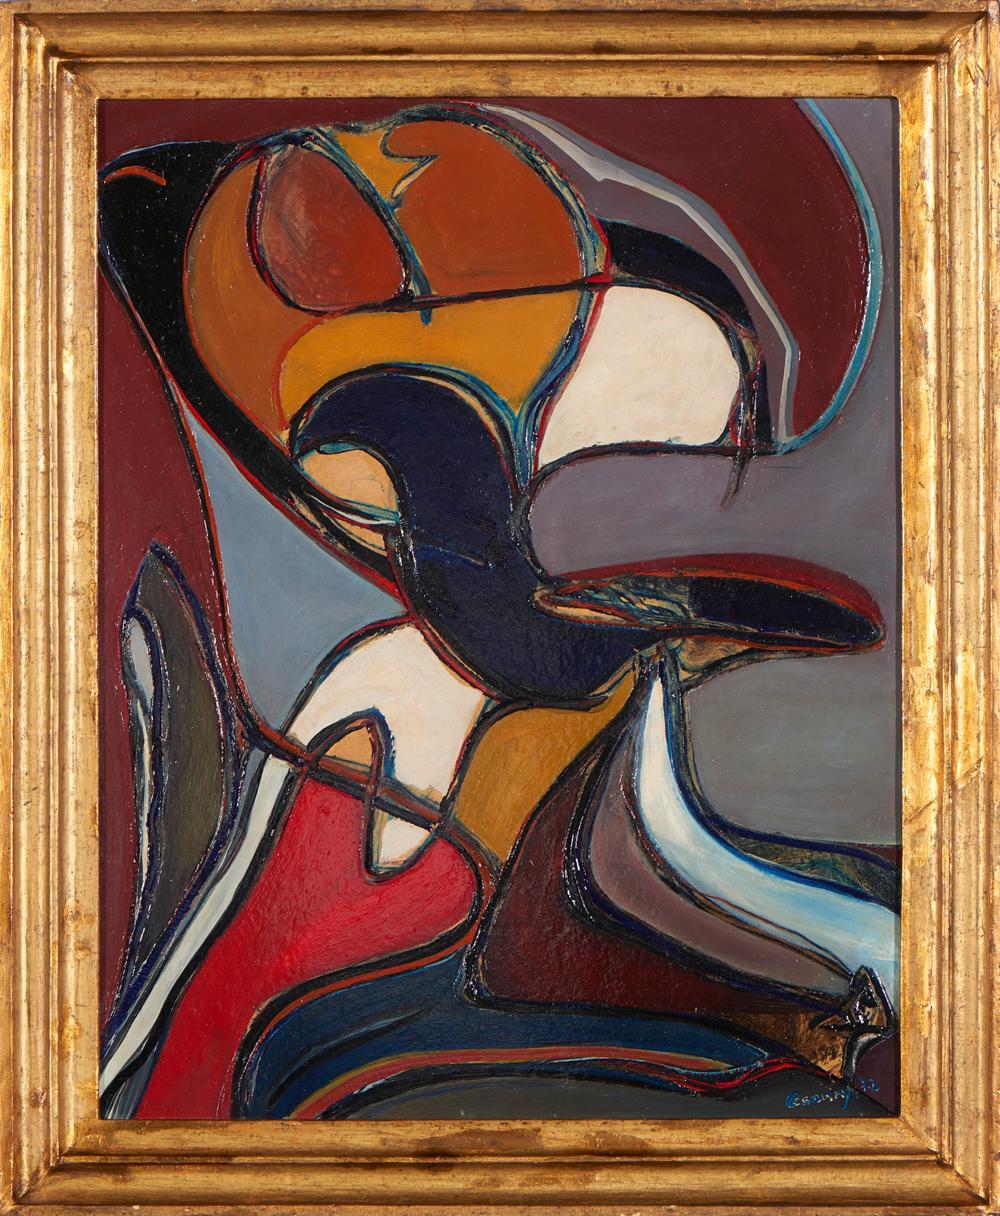 CESARINY, óleo s/tela, 65 x 50 cm.